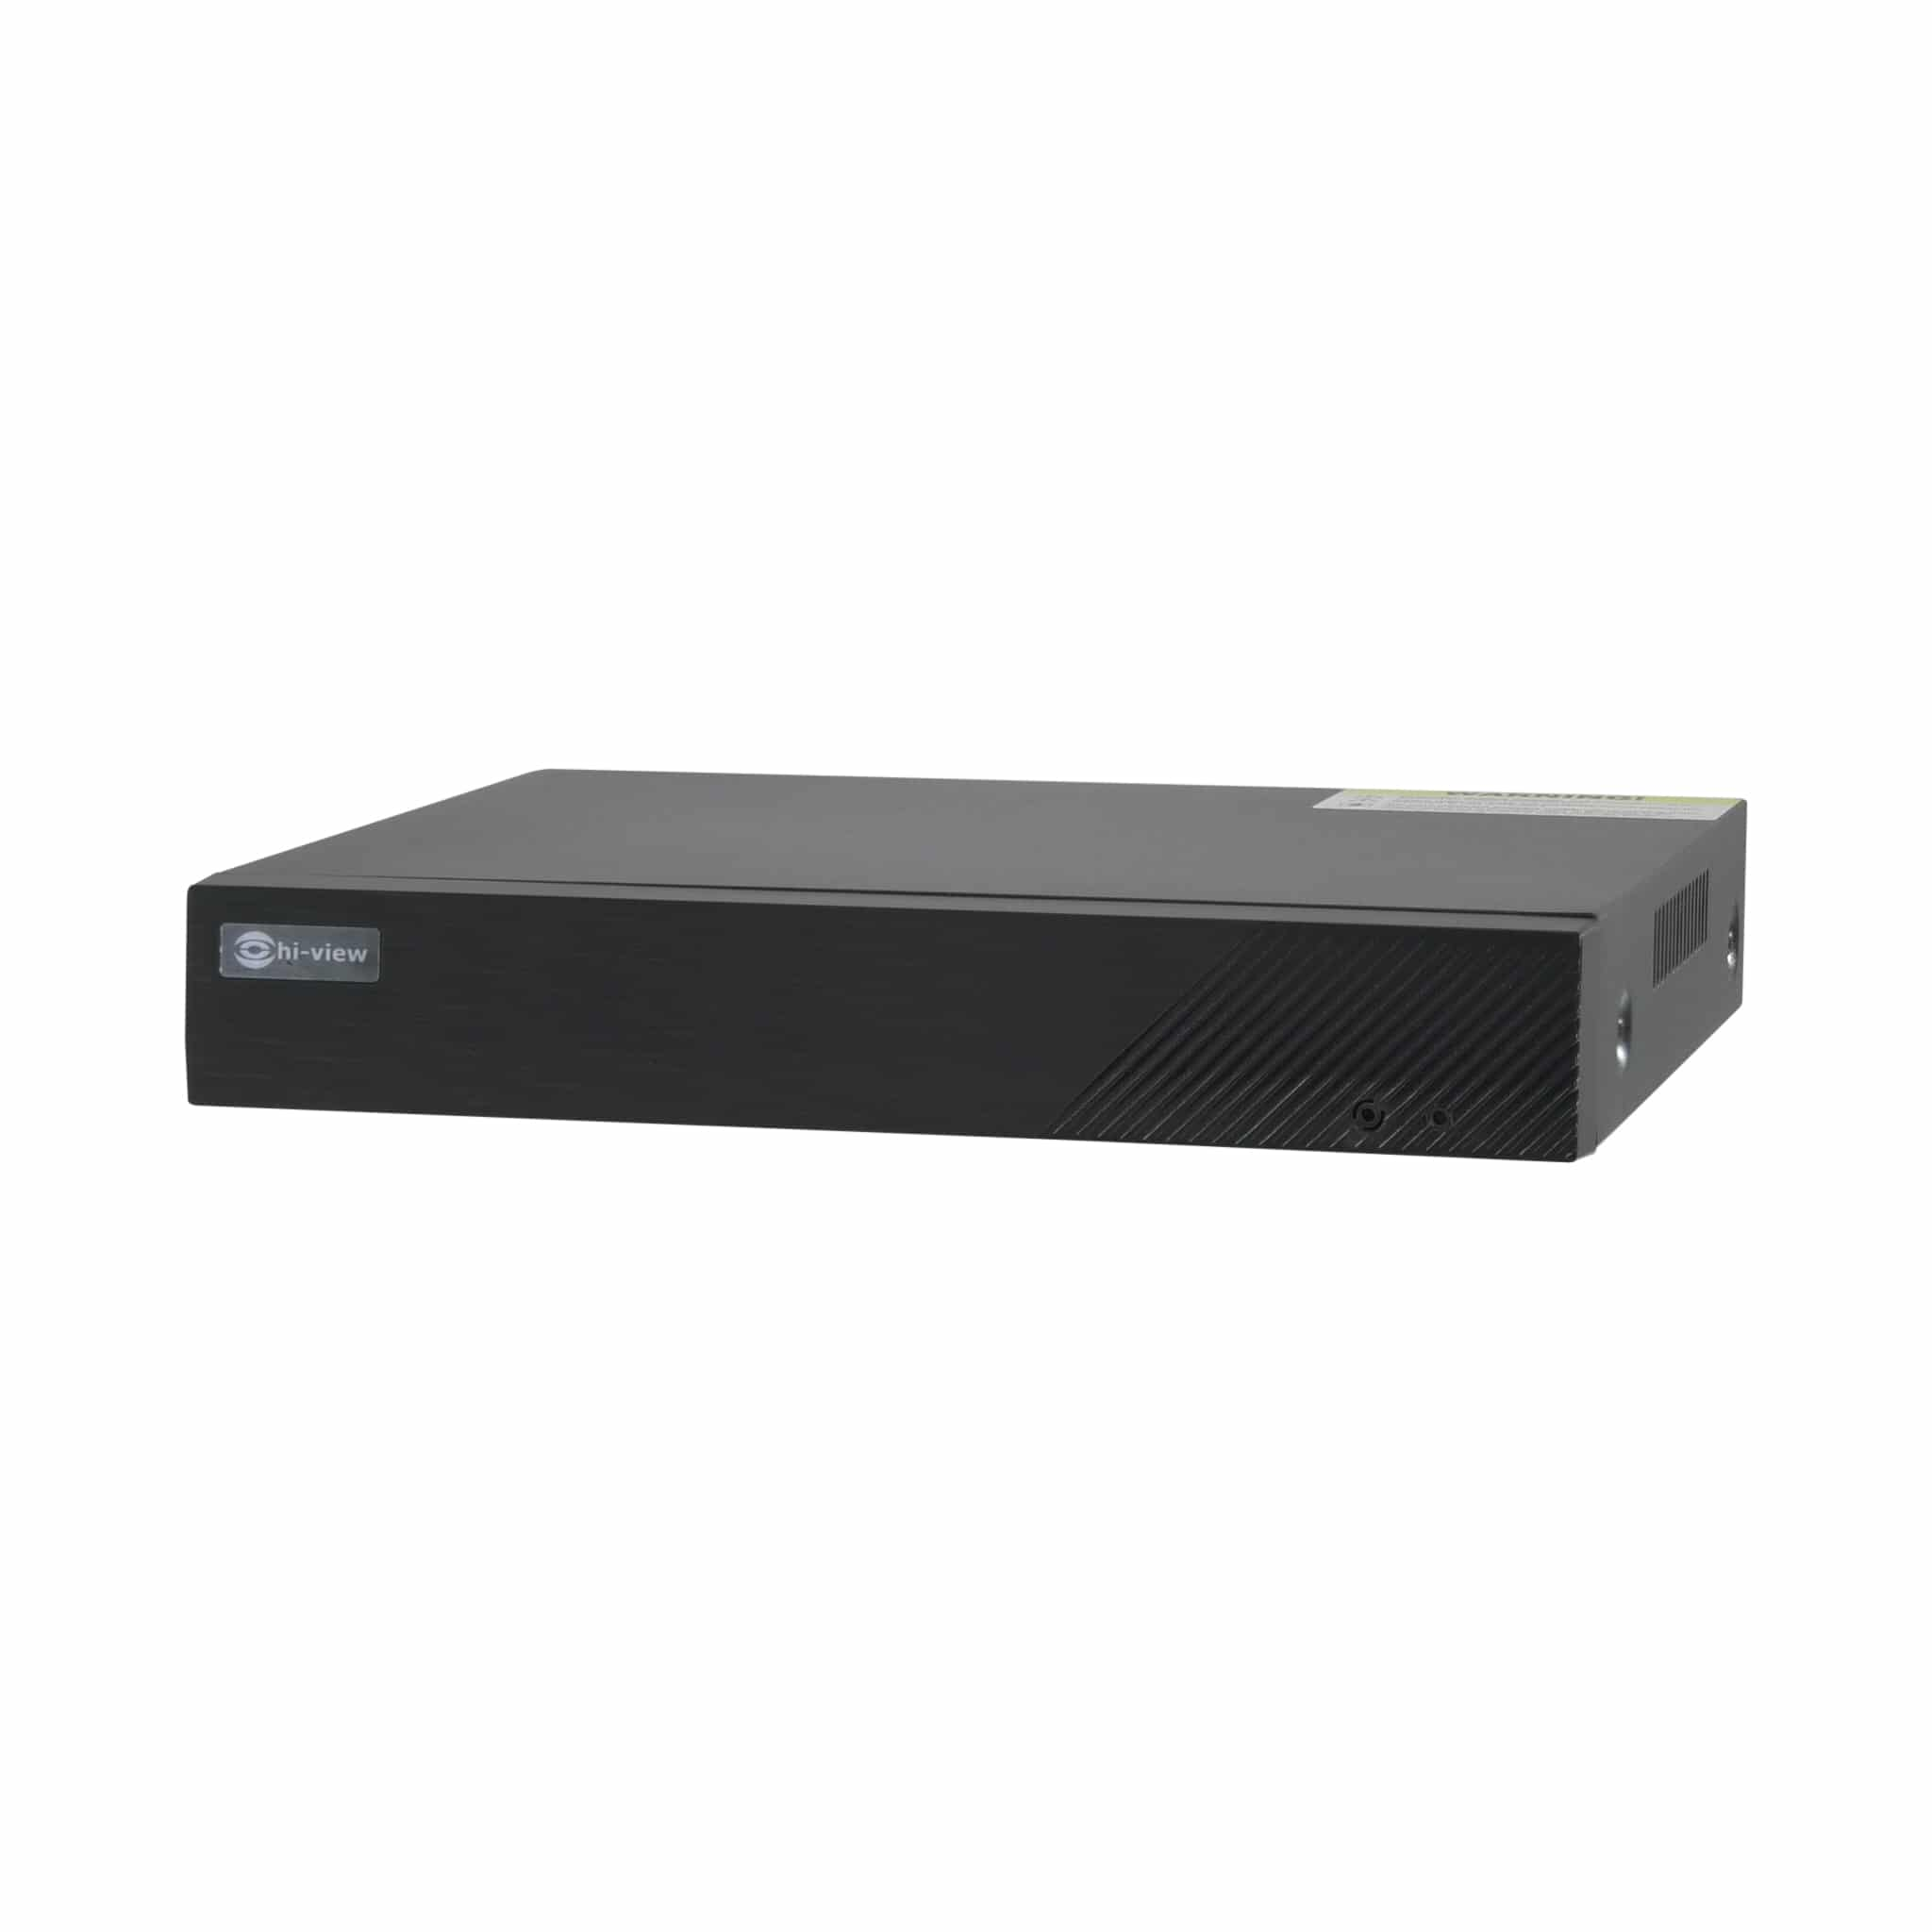 HP-9704